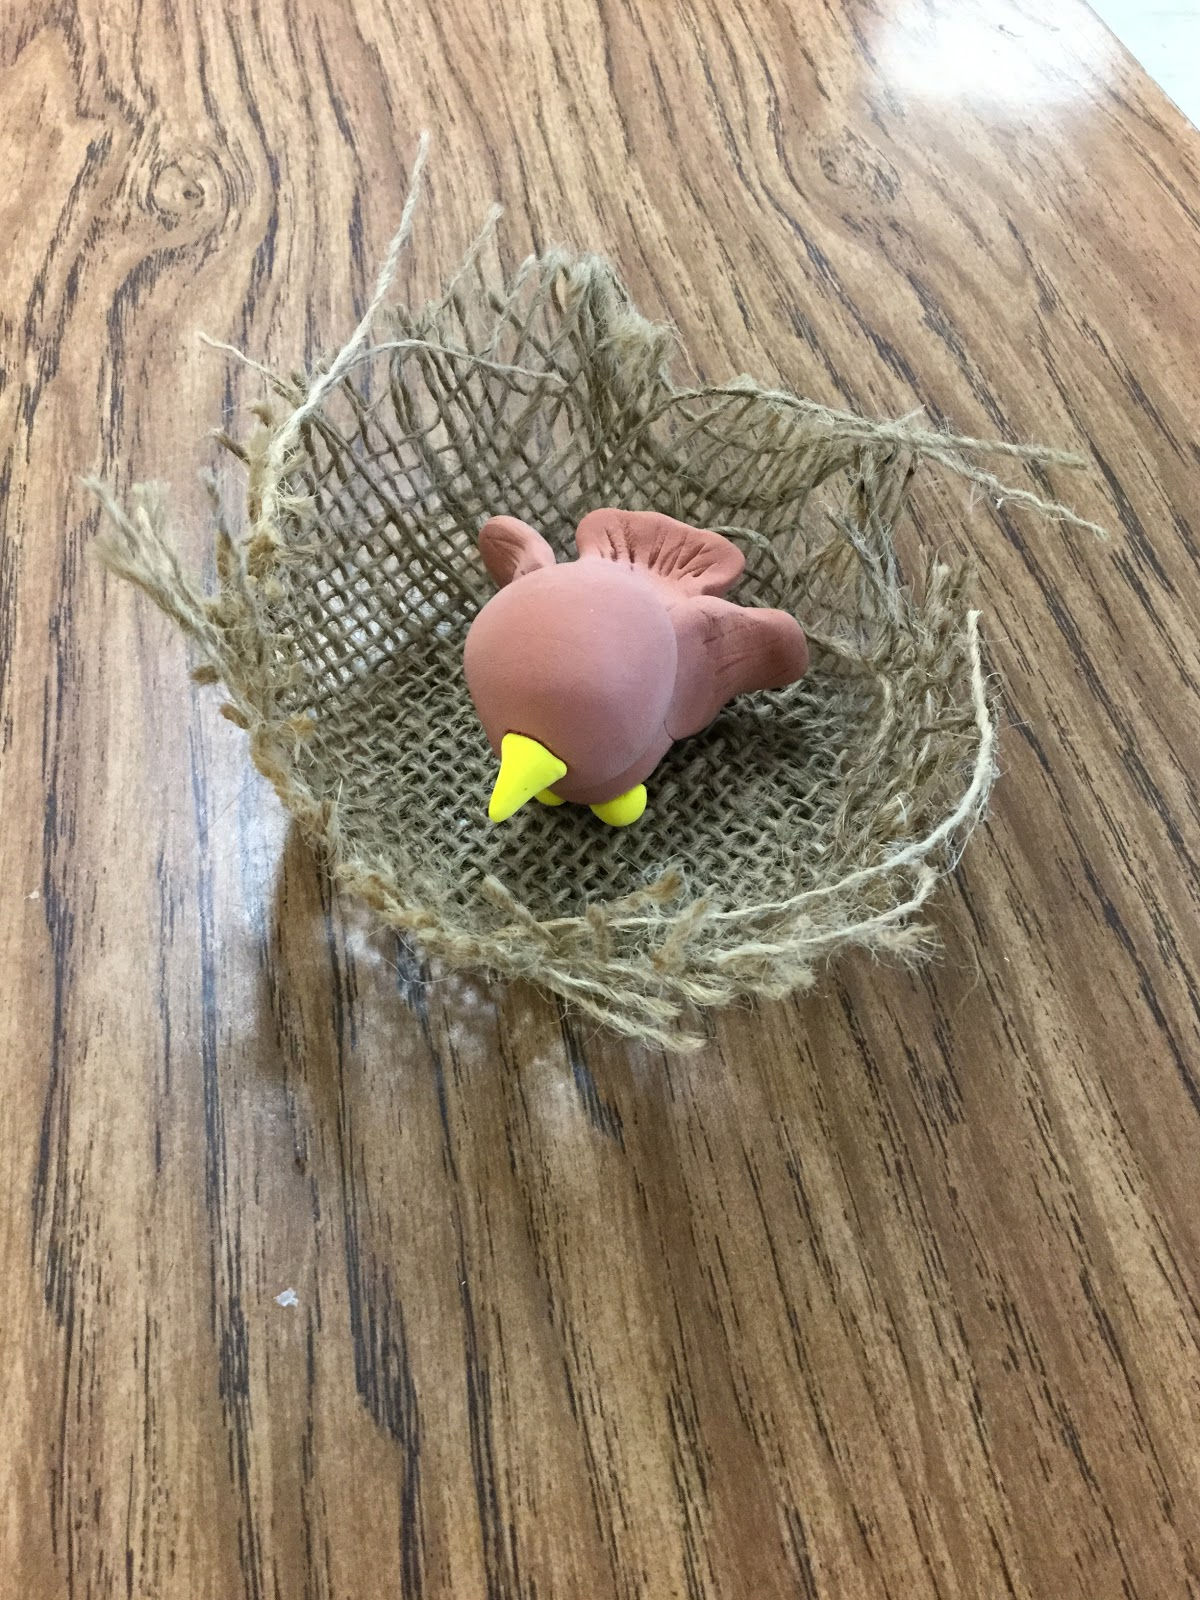 The Olive Branch Nest for Celeste Update